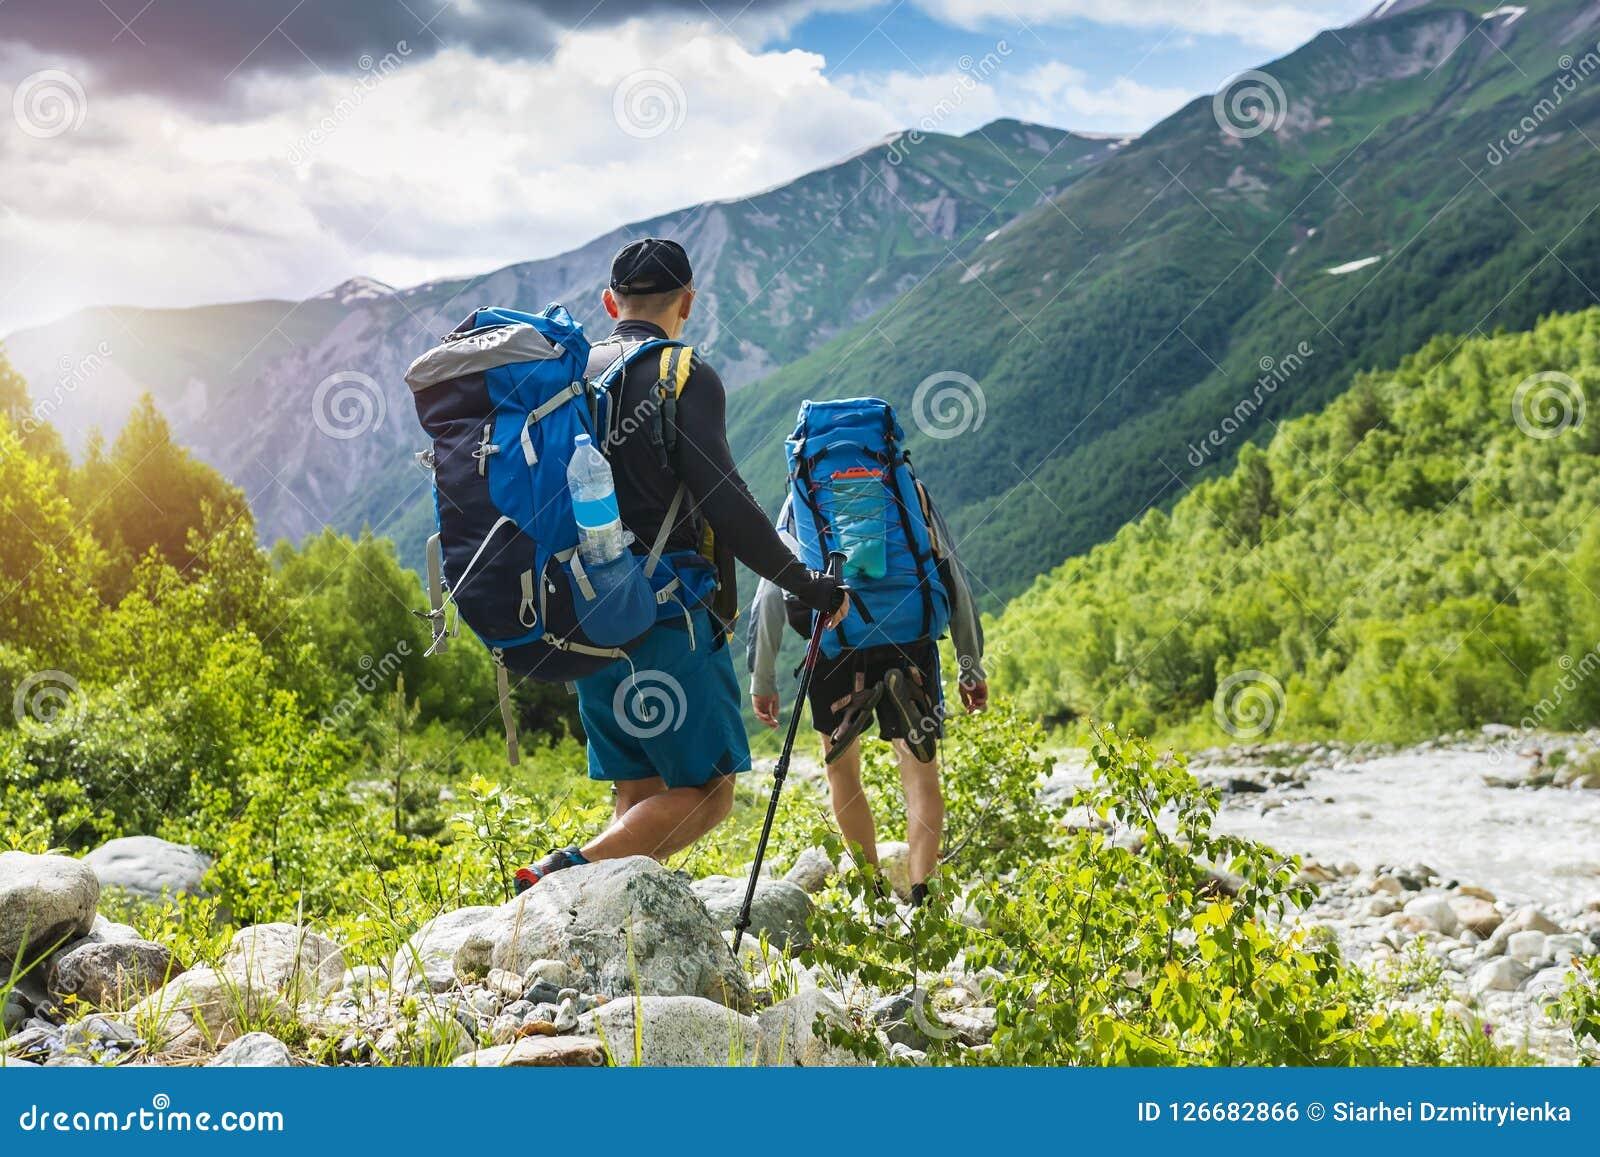 150567ed4a οδοιπορία βουνών βουνό του Μαυροβουνίου komovi πεζοπορίας Τουρίστες με το  πεζοπορώ σακιδίων πλάτης στο δύσκολο τρόπο